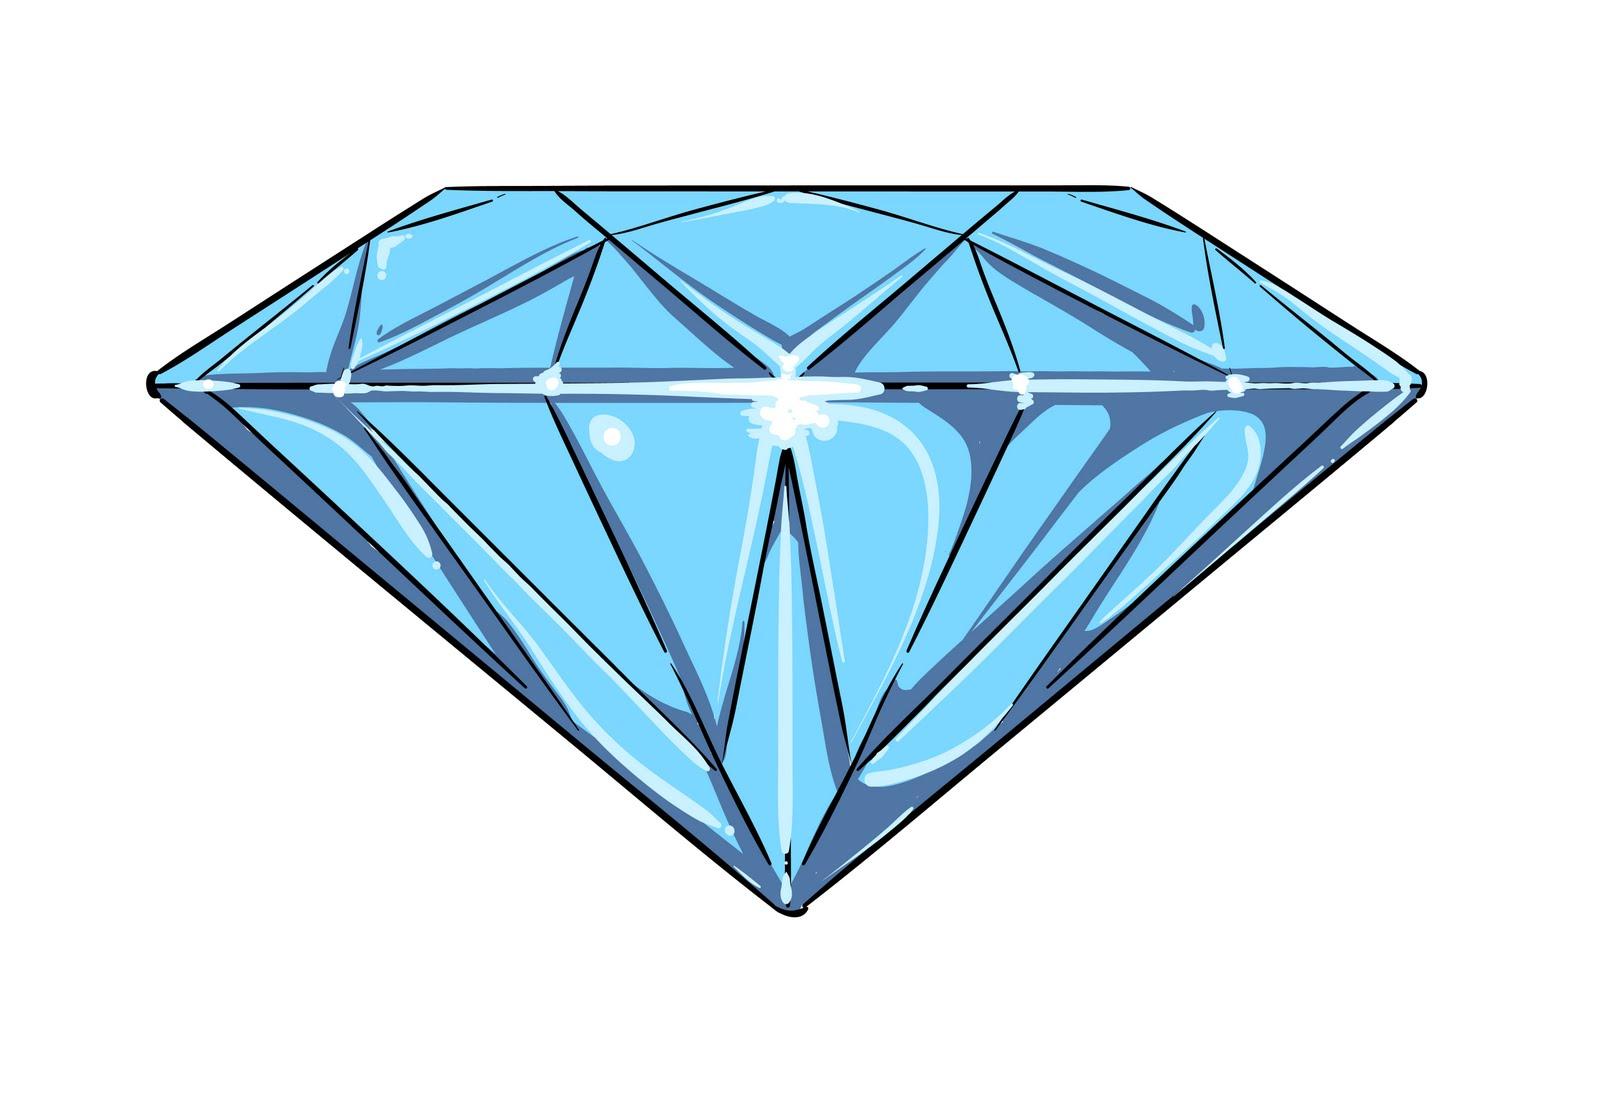 Free Diamond Cartoon, Download Free Clip Art, Free Clip Art.